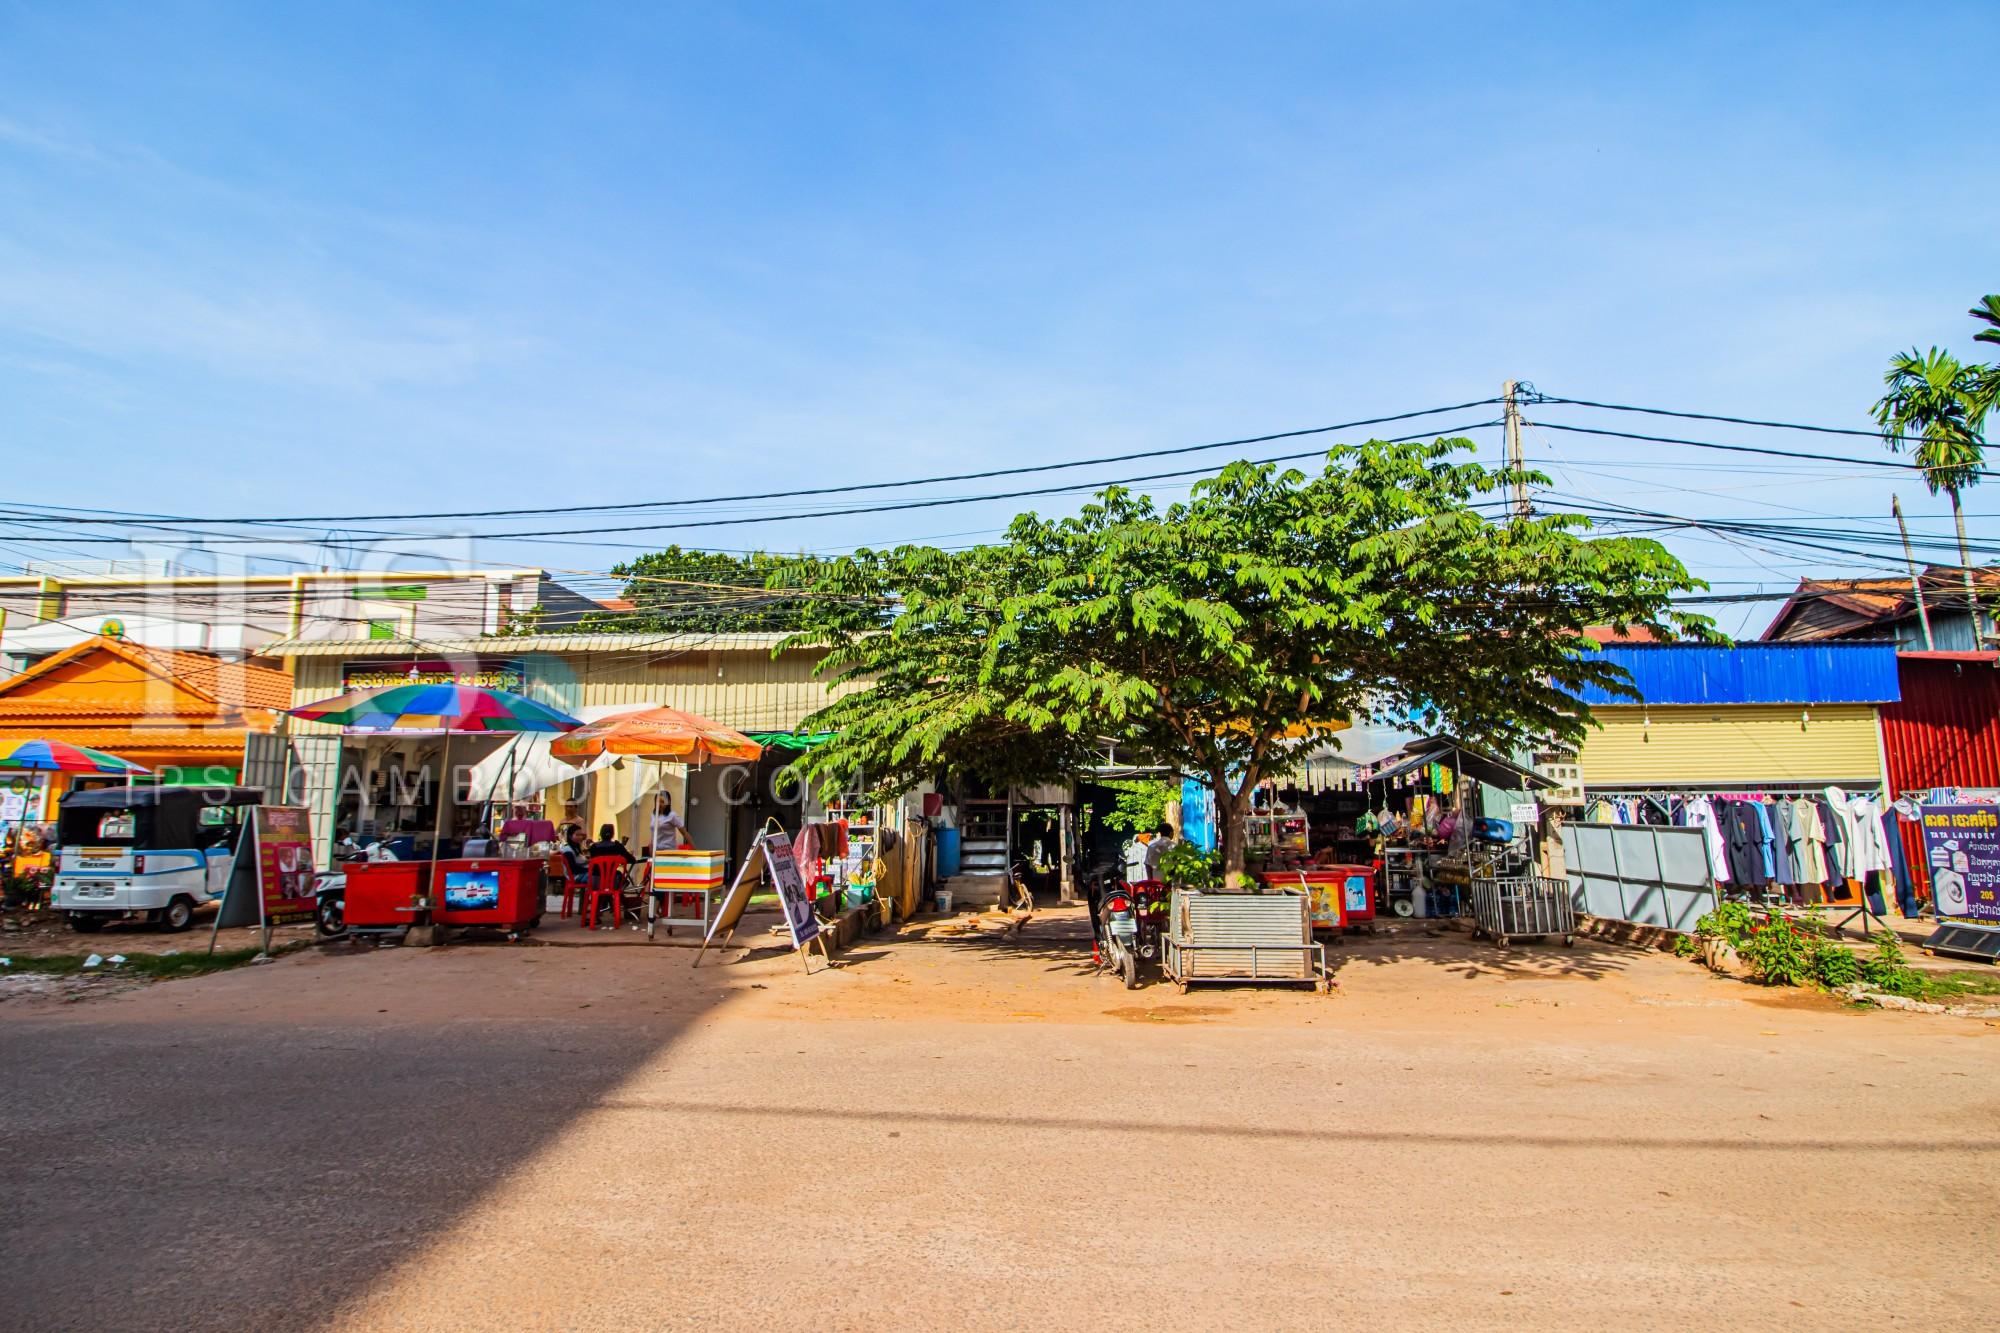 752 Sqm For Sale - Svay Dangkum, Siem Reap